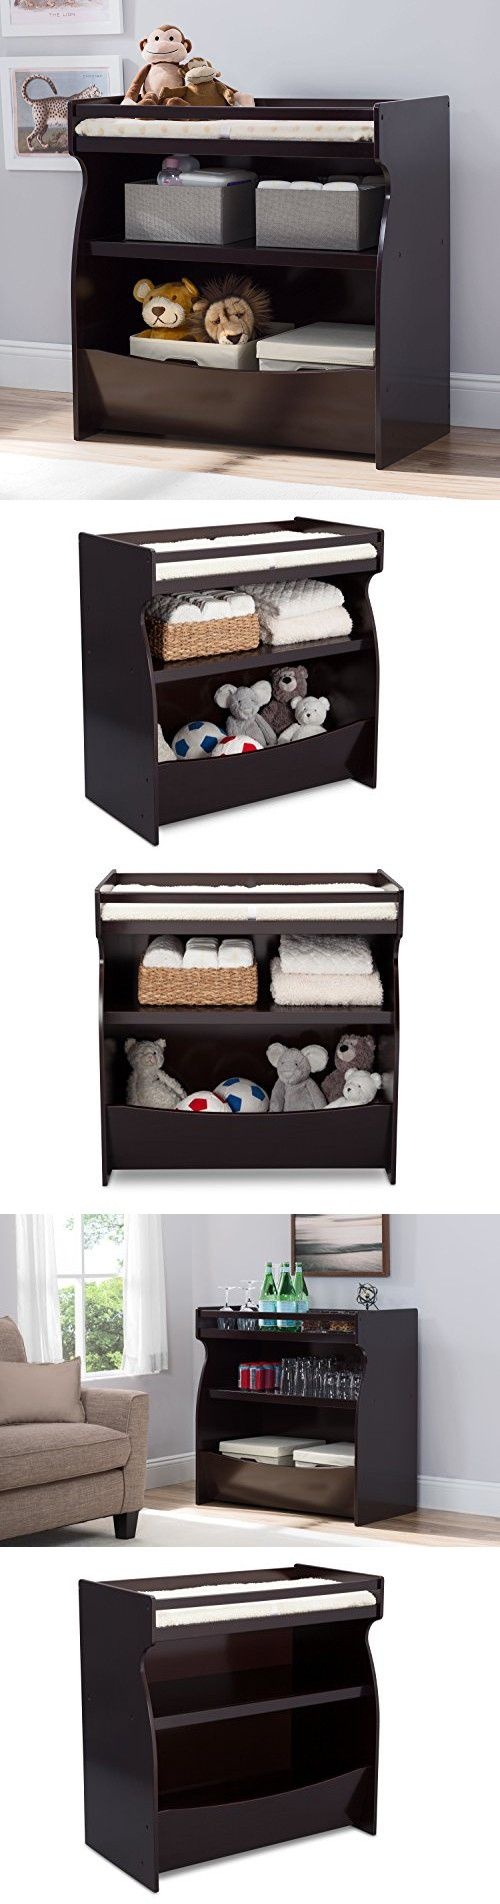 Delta Children 2-in-1 Changing Table and Storage Unit, Dark Chocolate